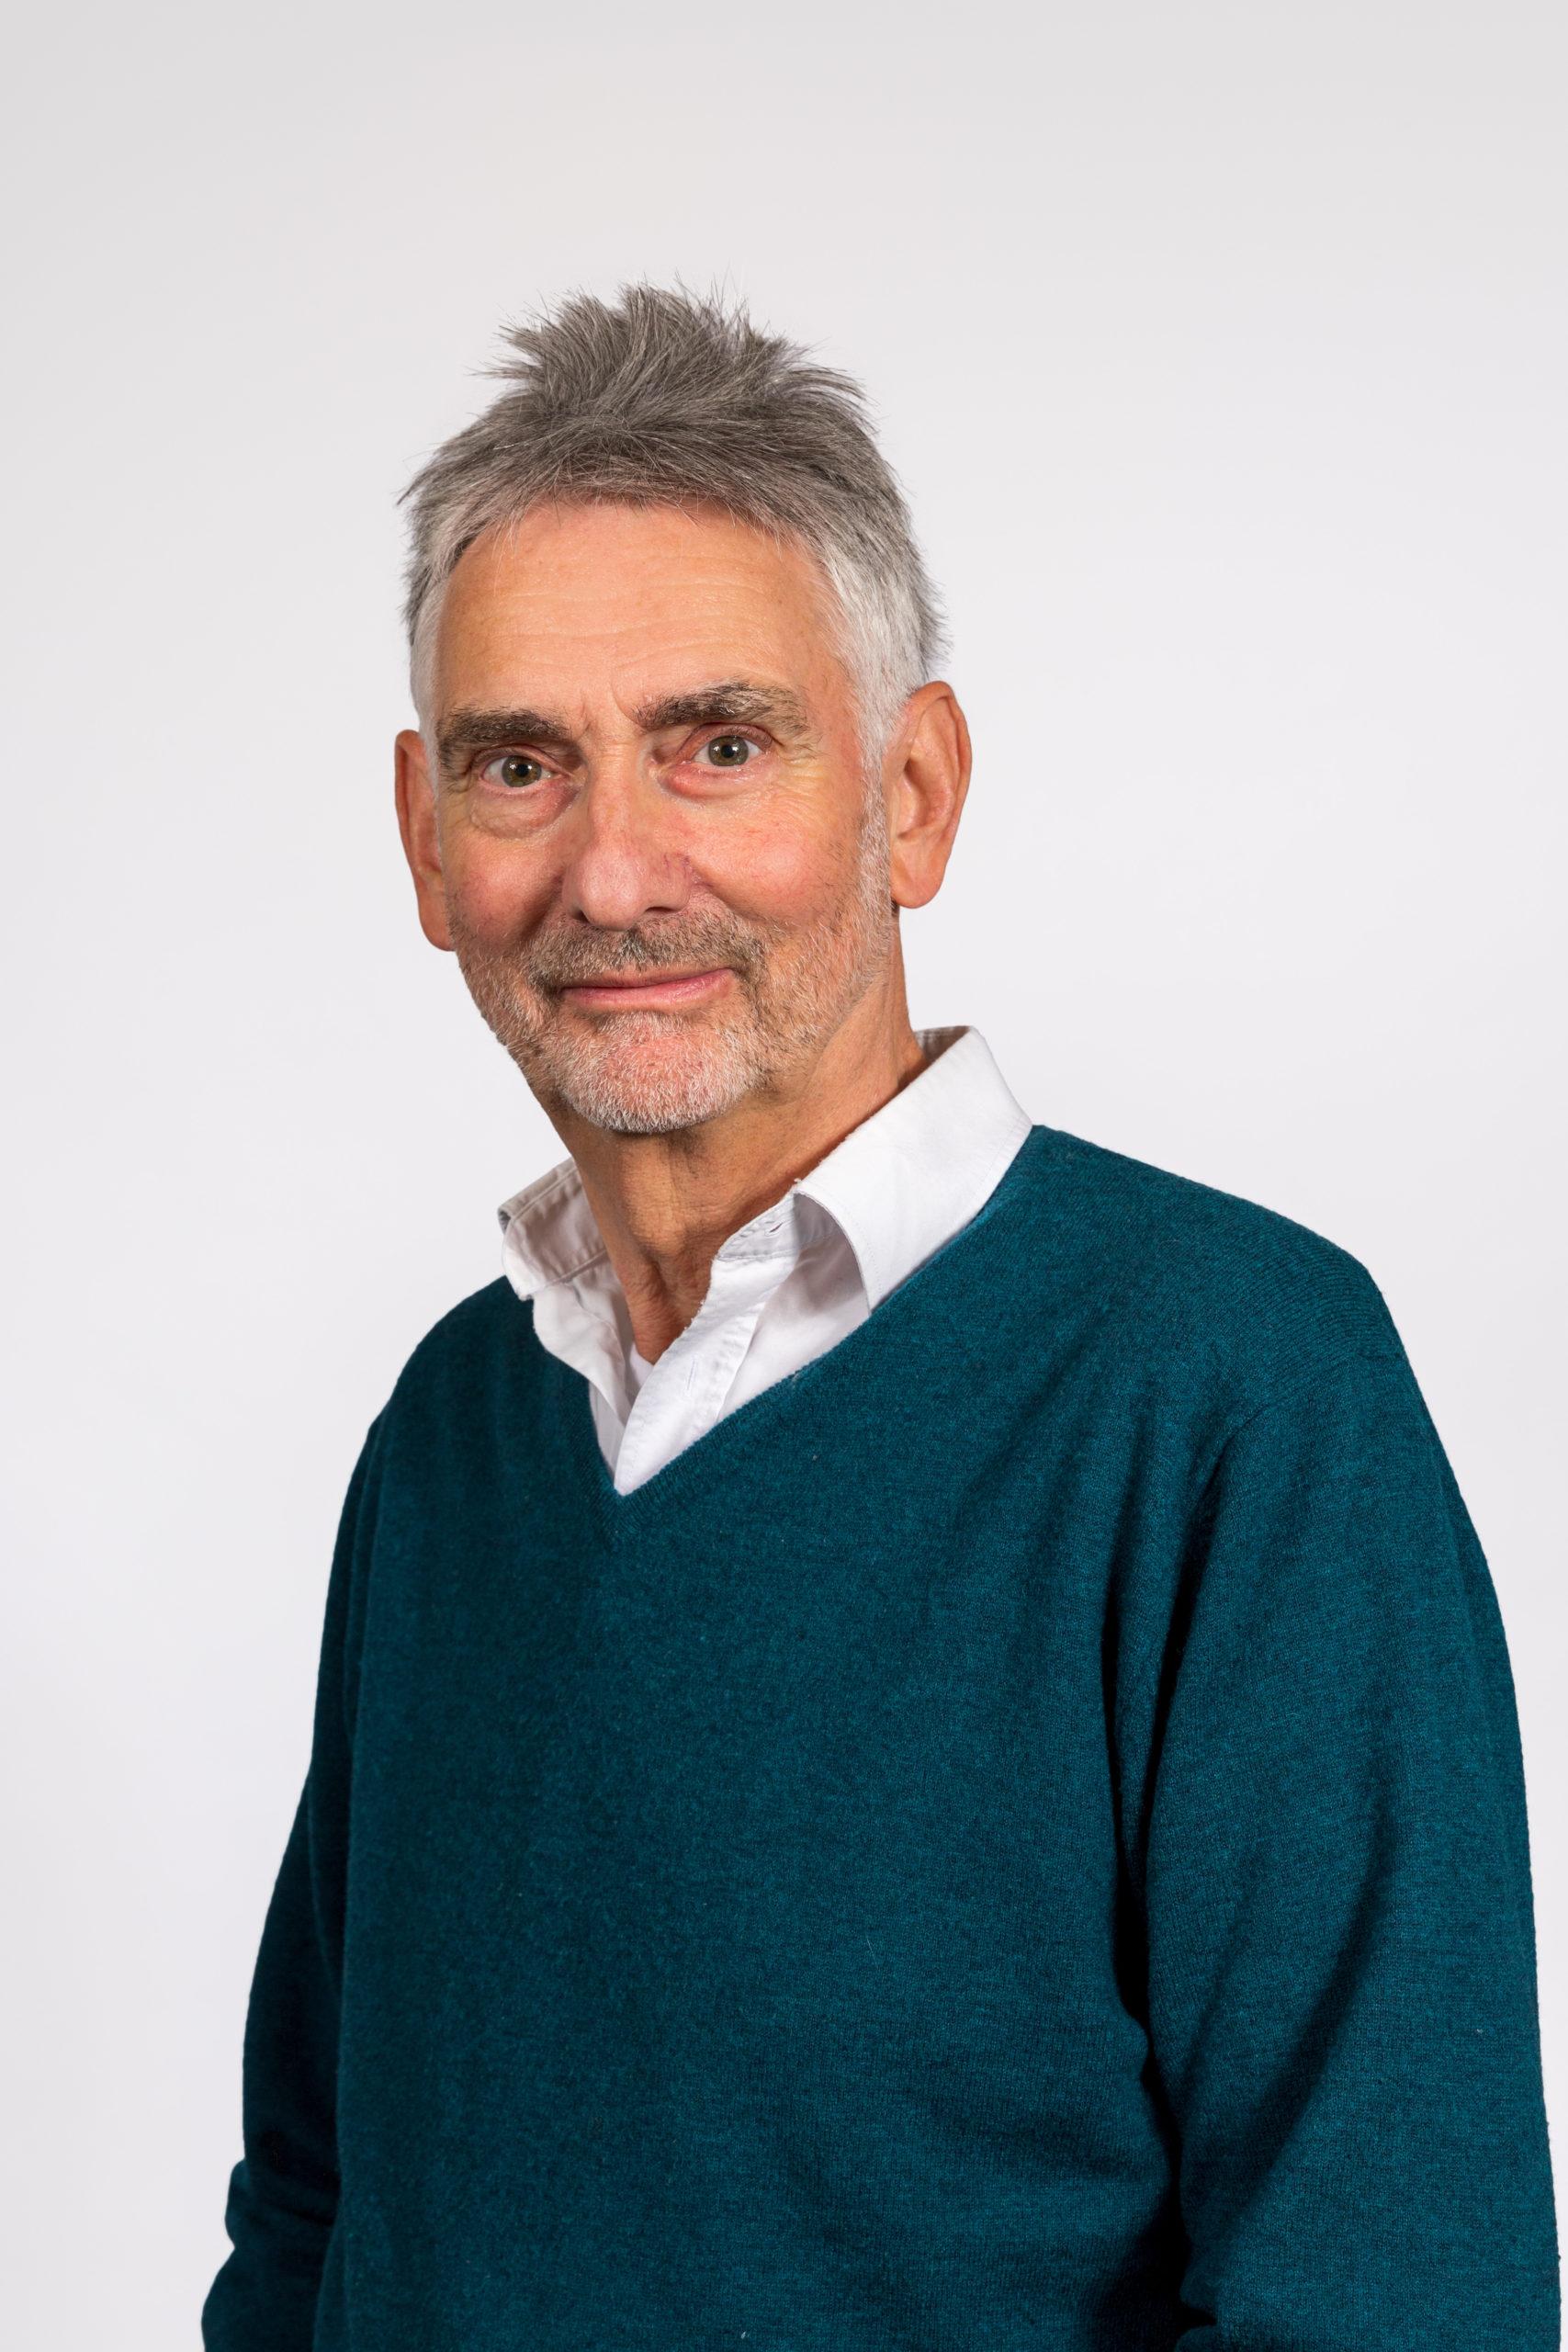 Wim van der Stouwe